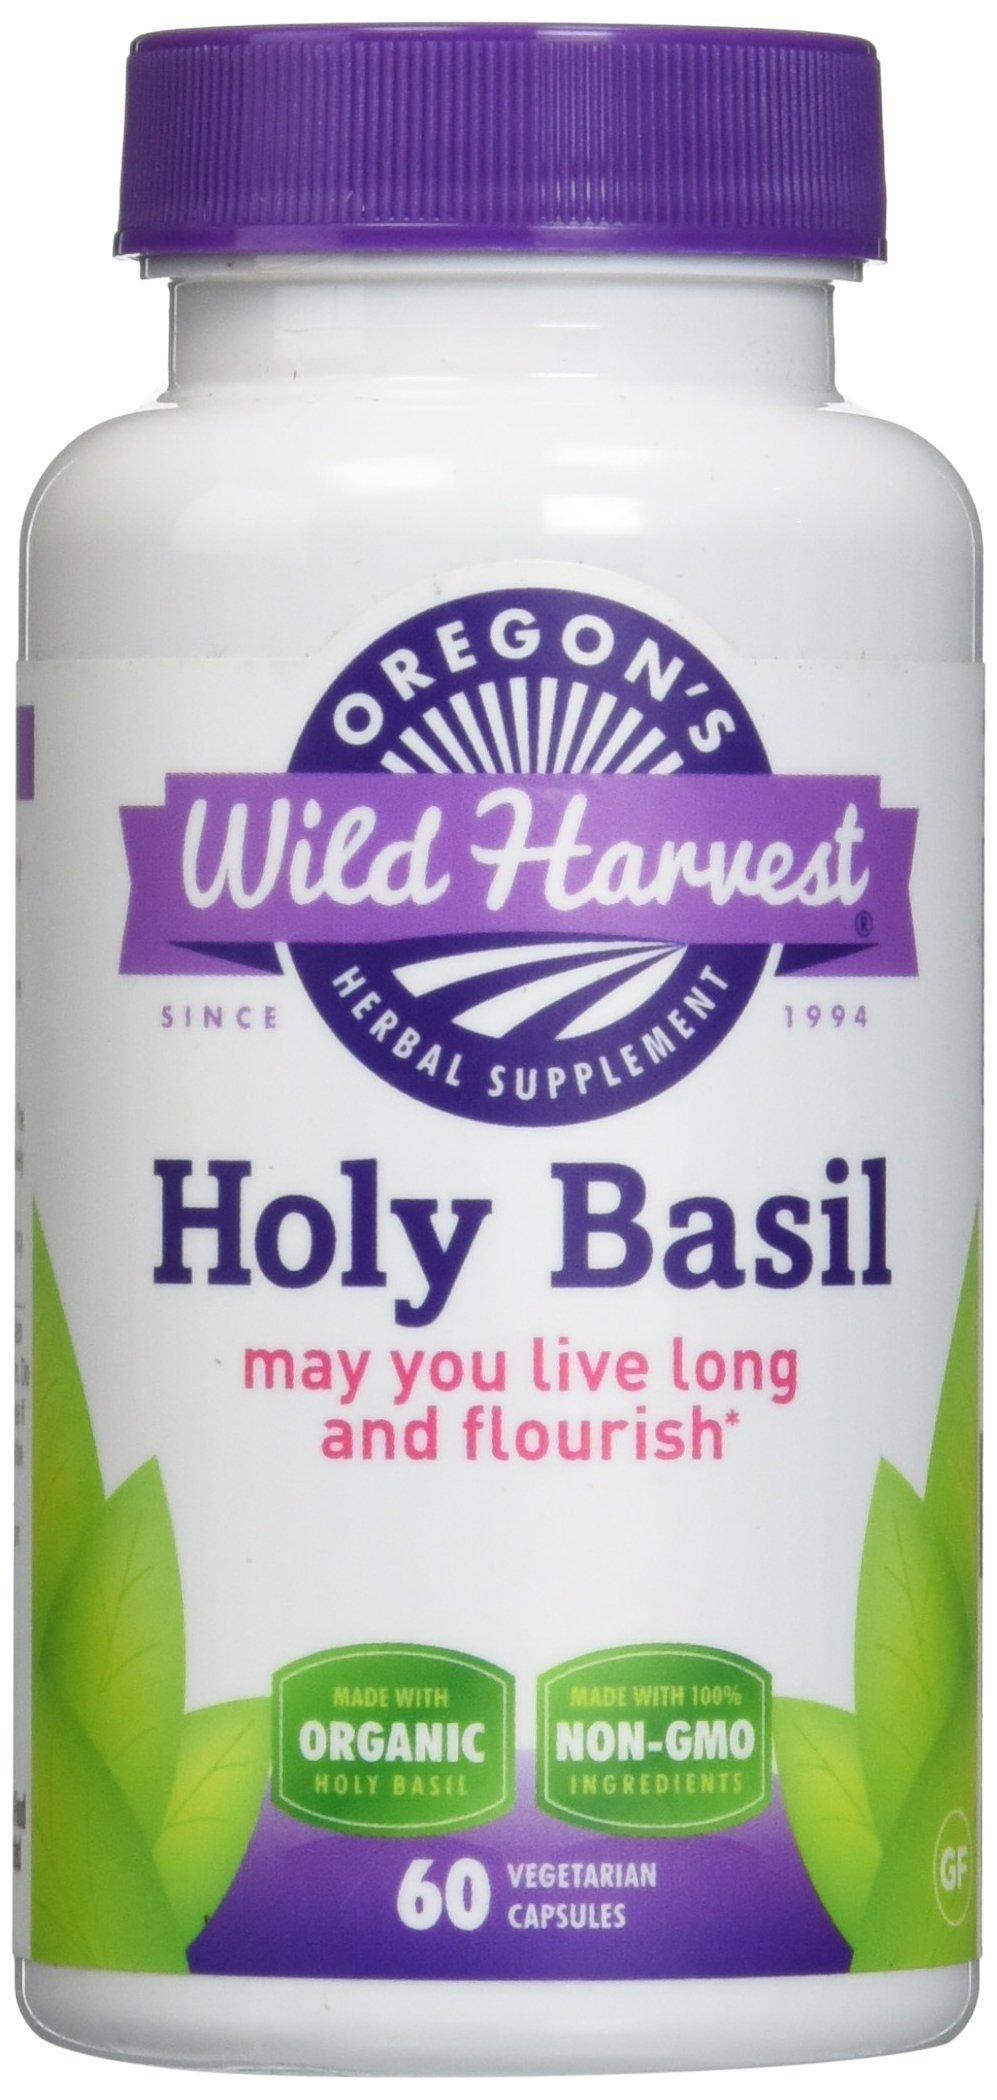 Oregon's Wild Harvest Holy Basil Organic Supplement, 60 Count vegetarian capsules, 800mg organic holy basil leaf